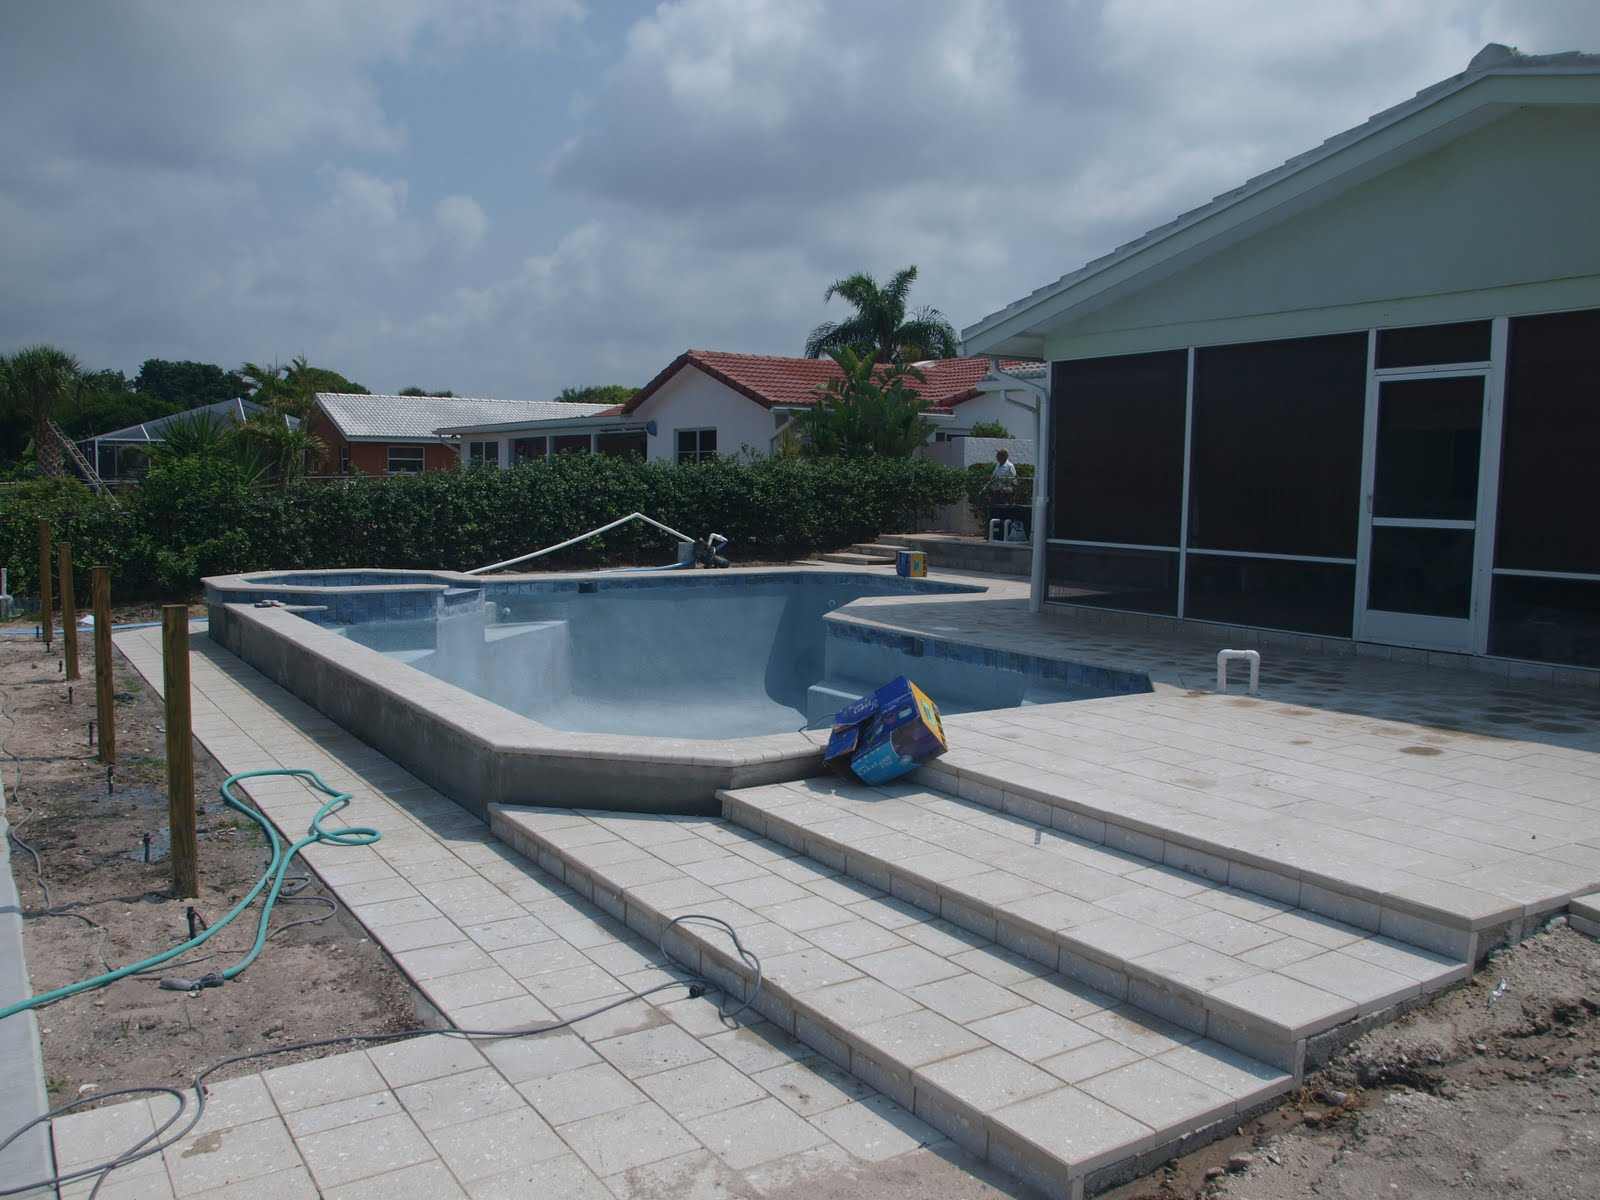 The New Blue Pool Pebbletec